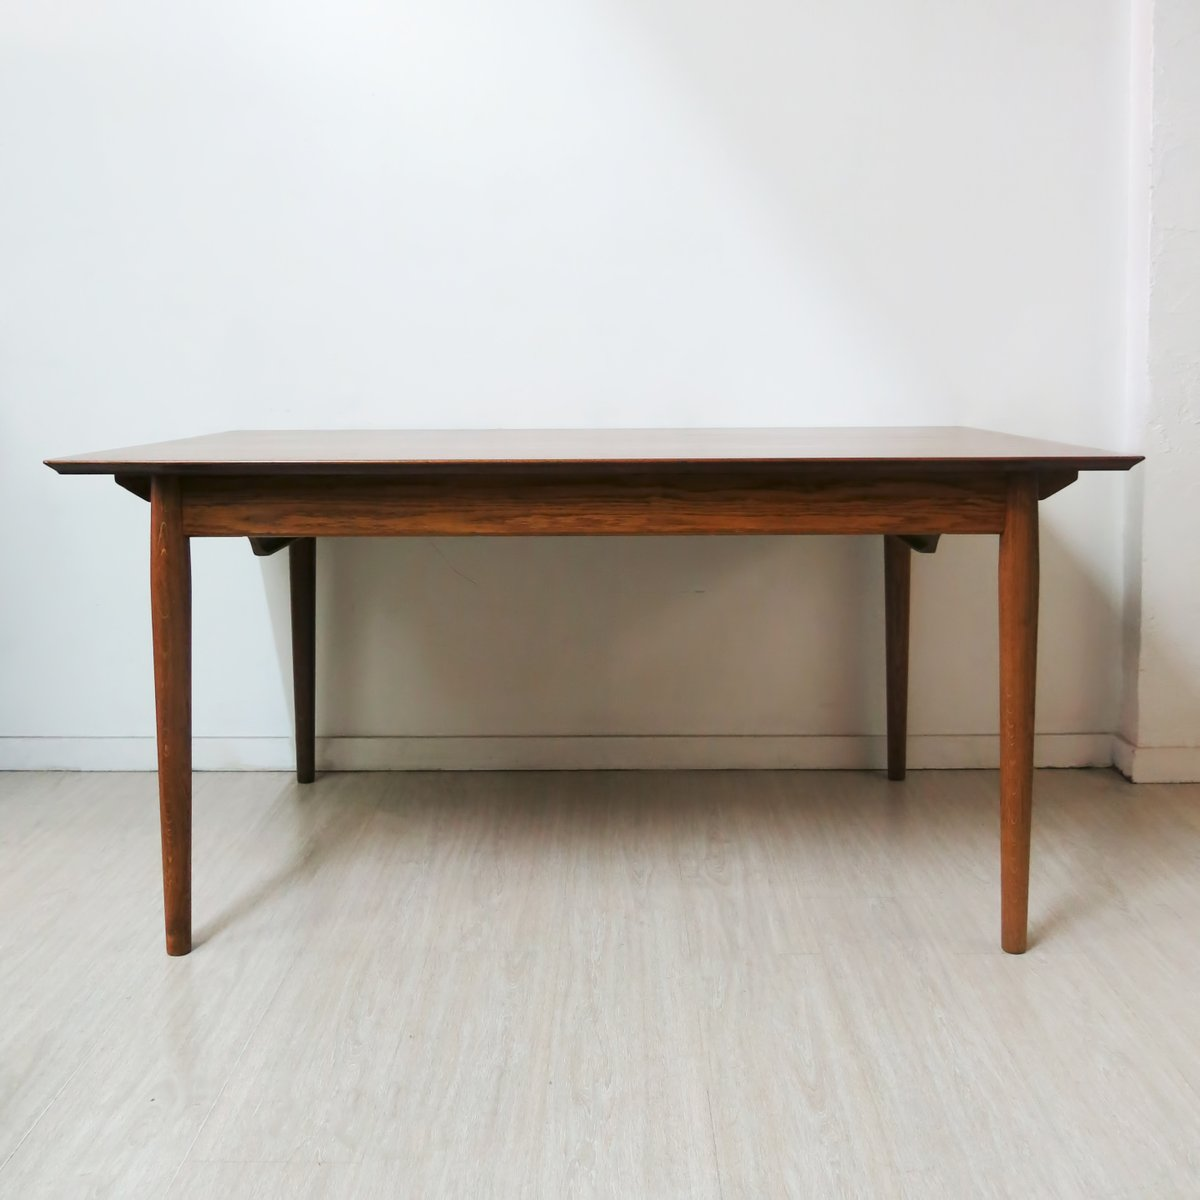 Dining Table By Arne Vodder For Sibast Furniture 1960s